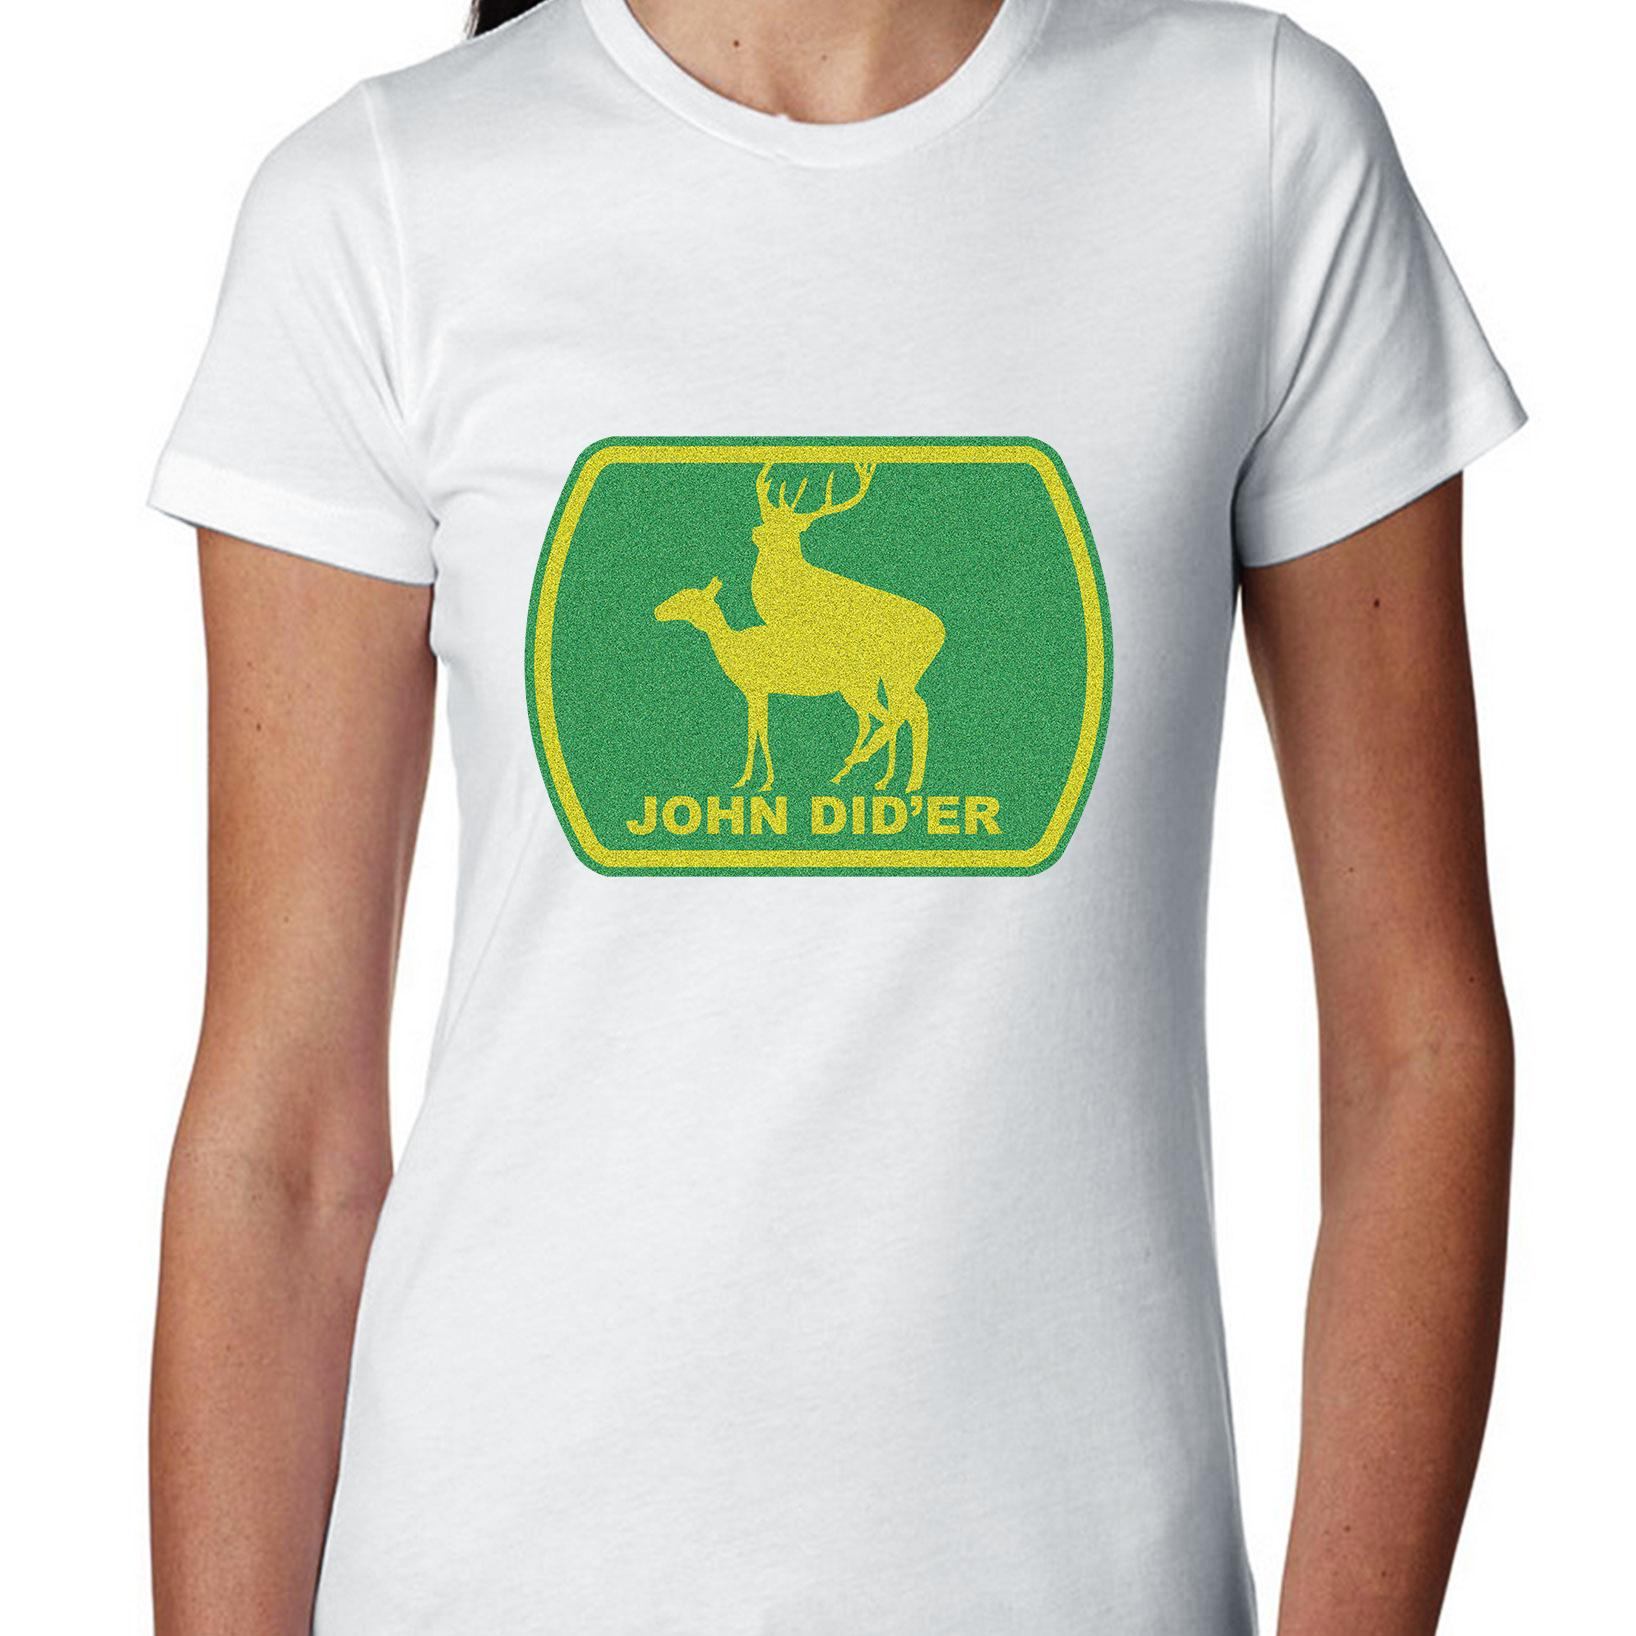 John Deere Shirts For Men